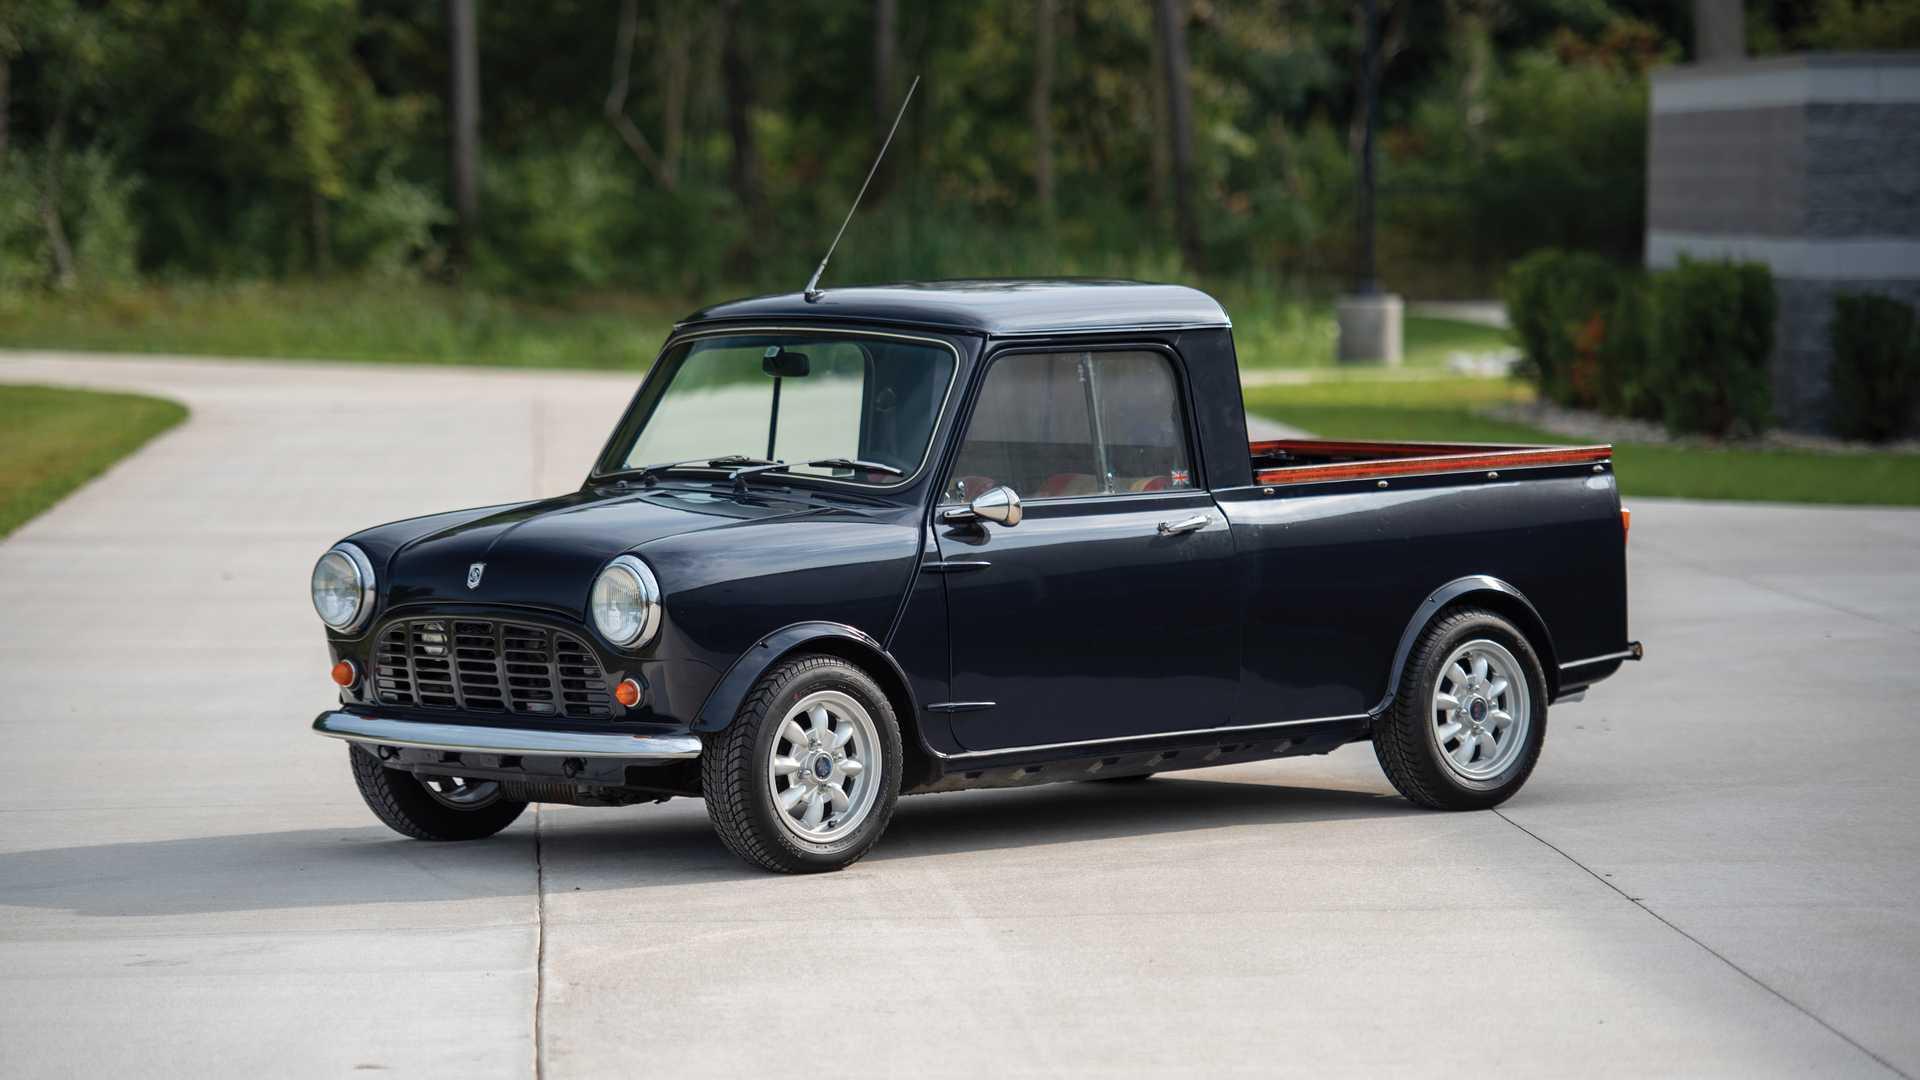 A subasta este Austin Mini de 1972: ¿el pick-up más adorable?